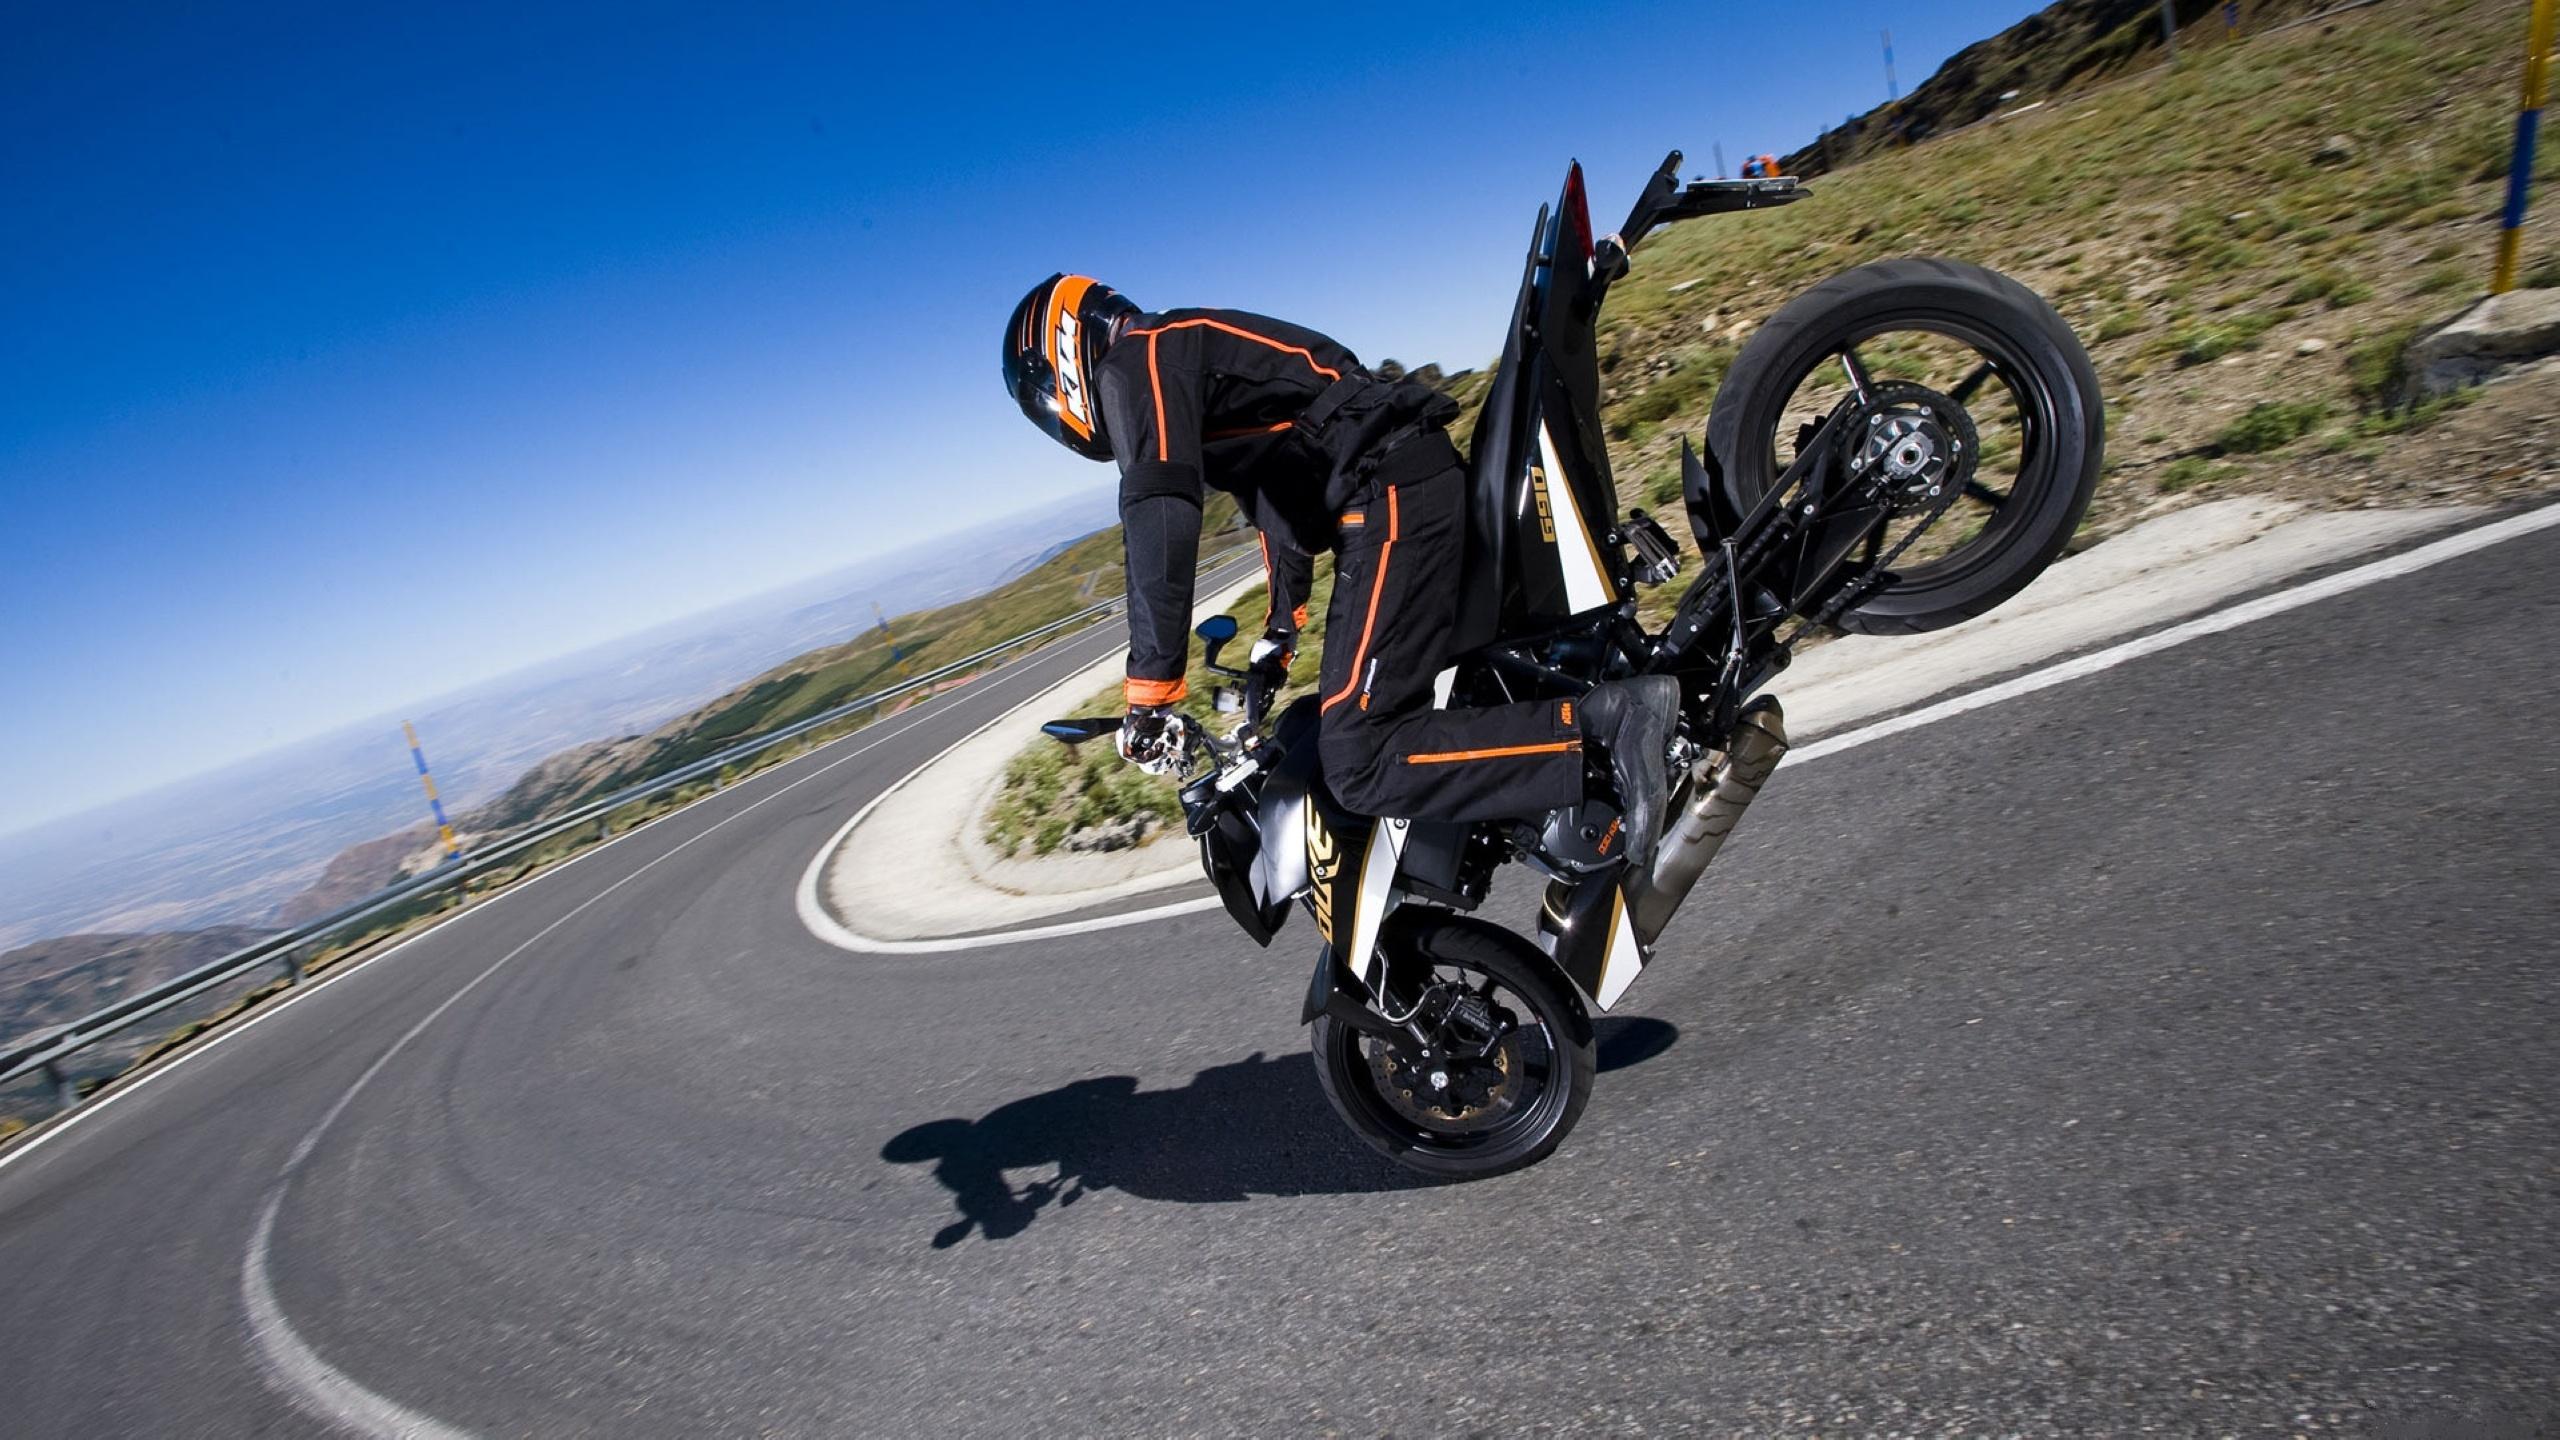 Download KTM 690 Duke Stoppie Bikes HD Wallpapers